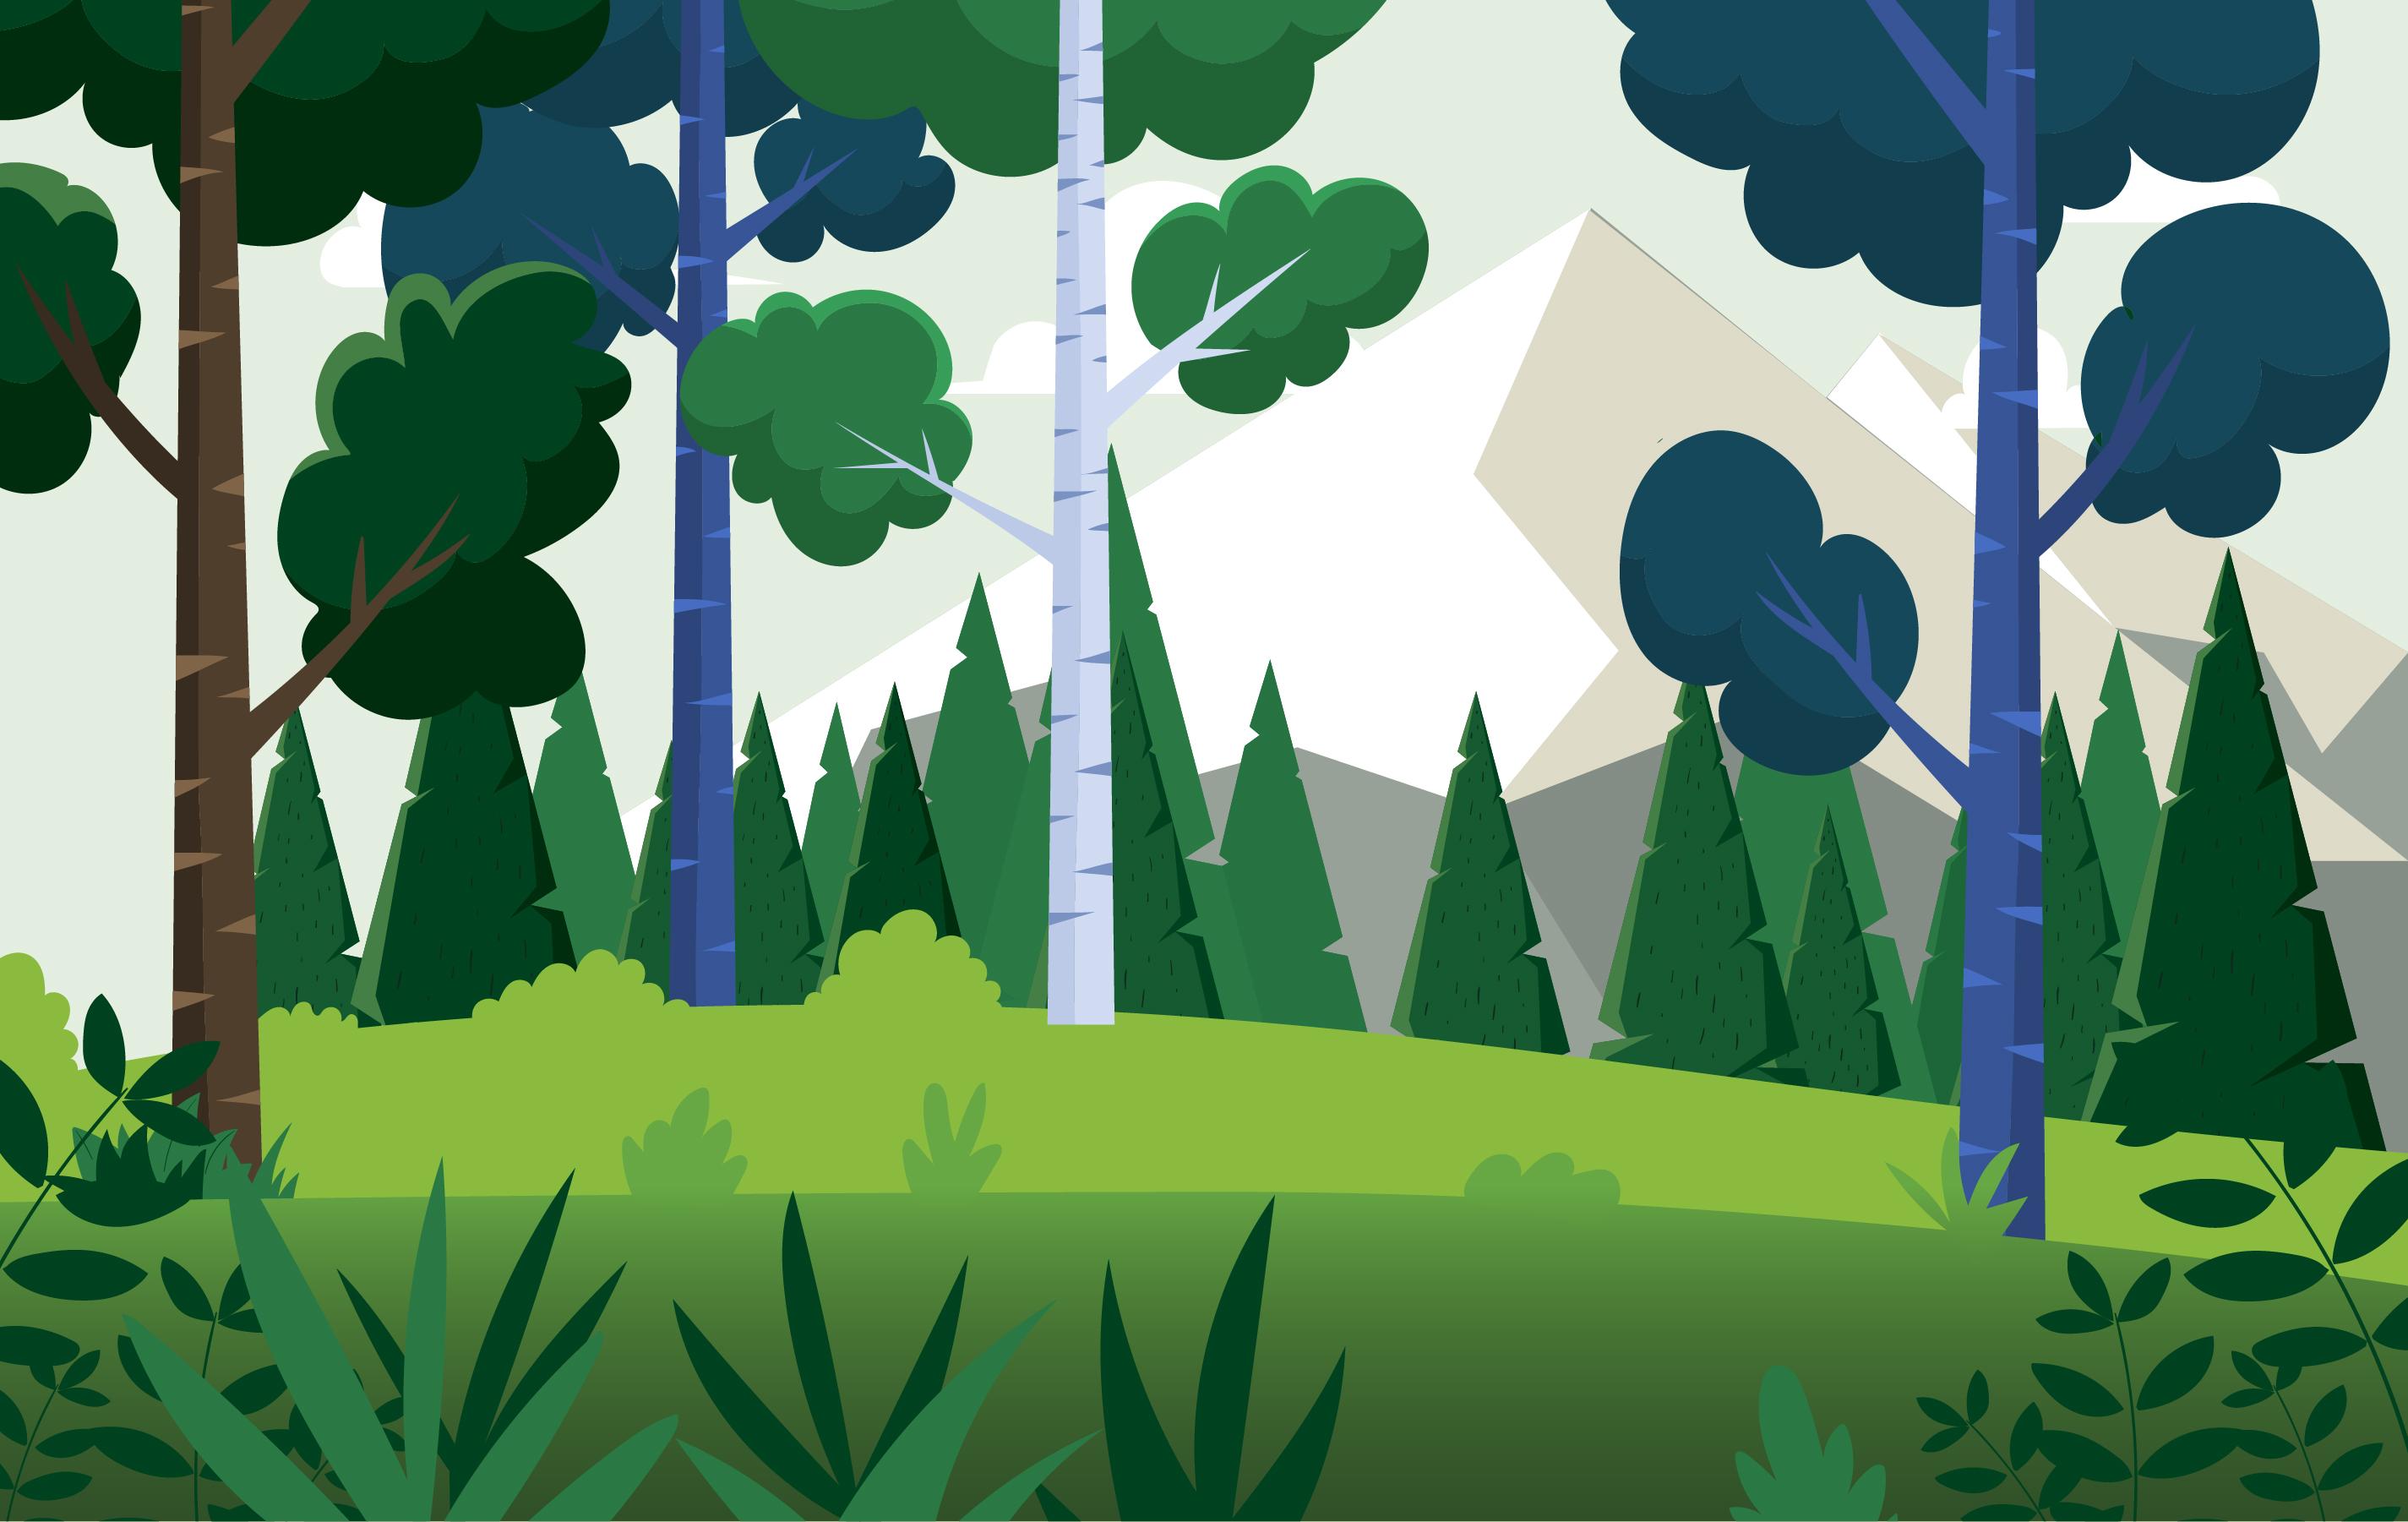 Landscape Illustration Vector Free: Vector Cartoon Landscape Illustration